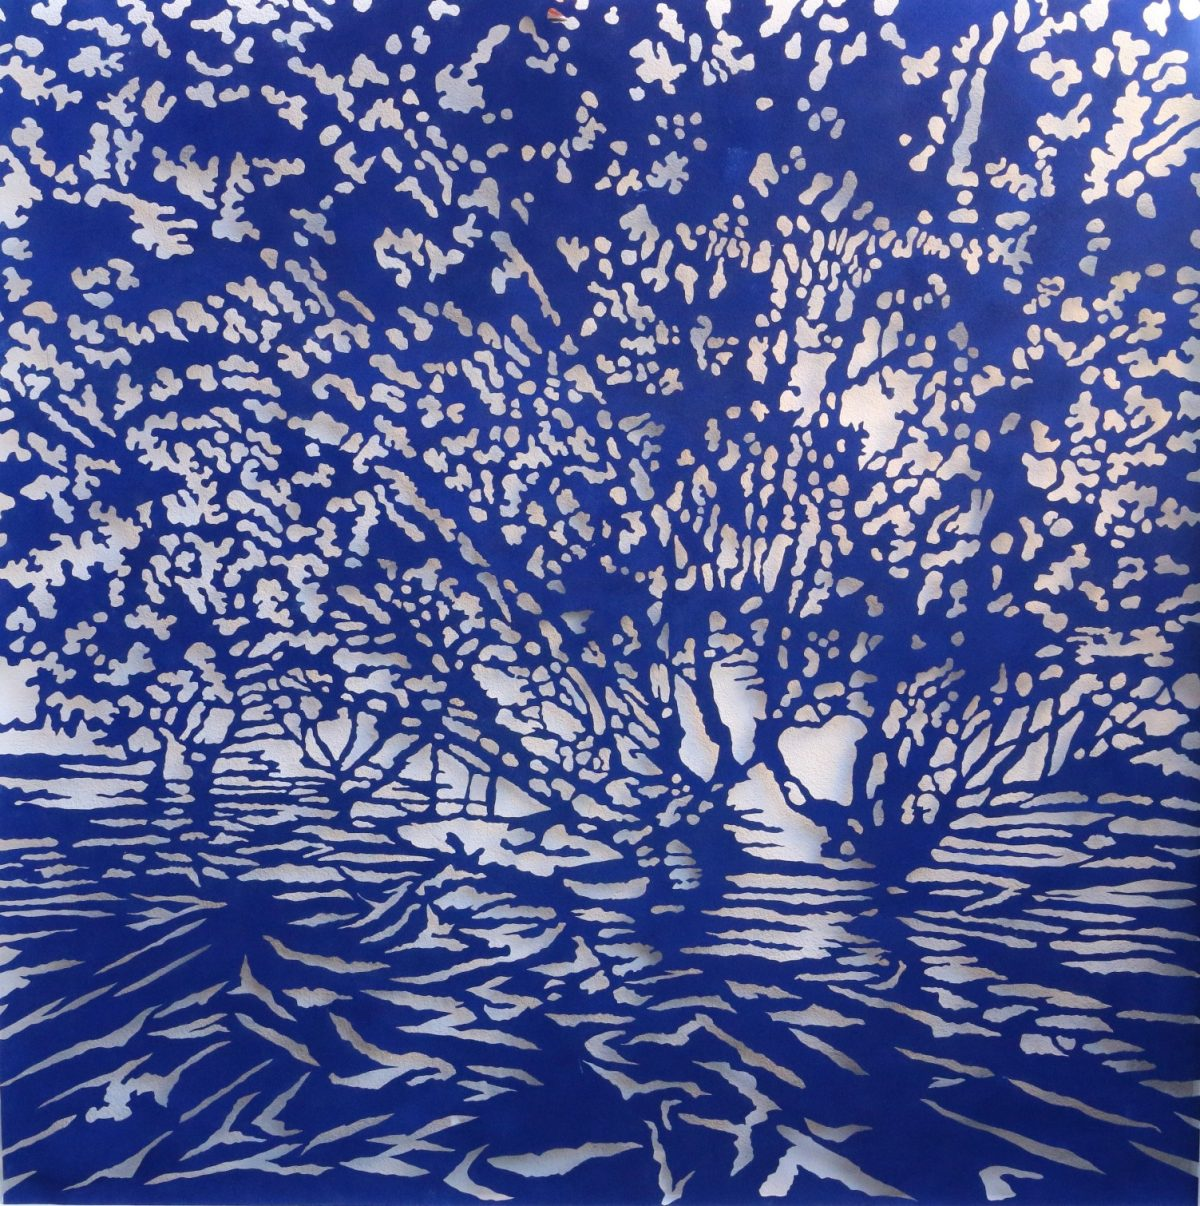 Art Atrium Andrew Tomkins - Blue Cut VIII low res